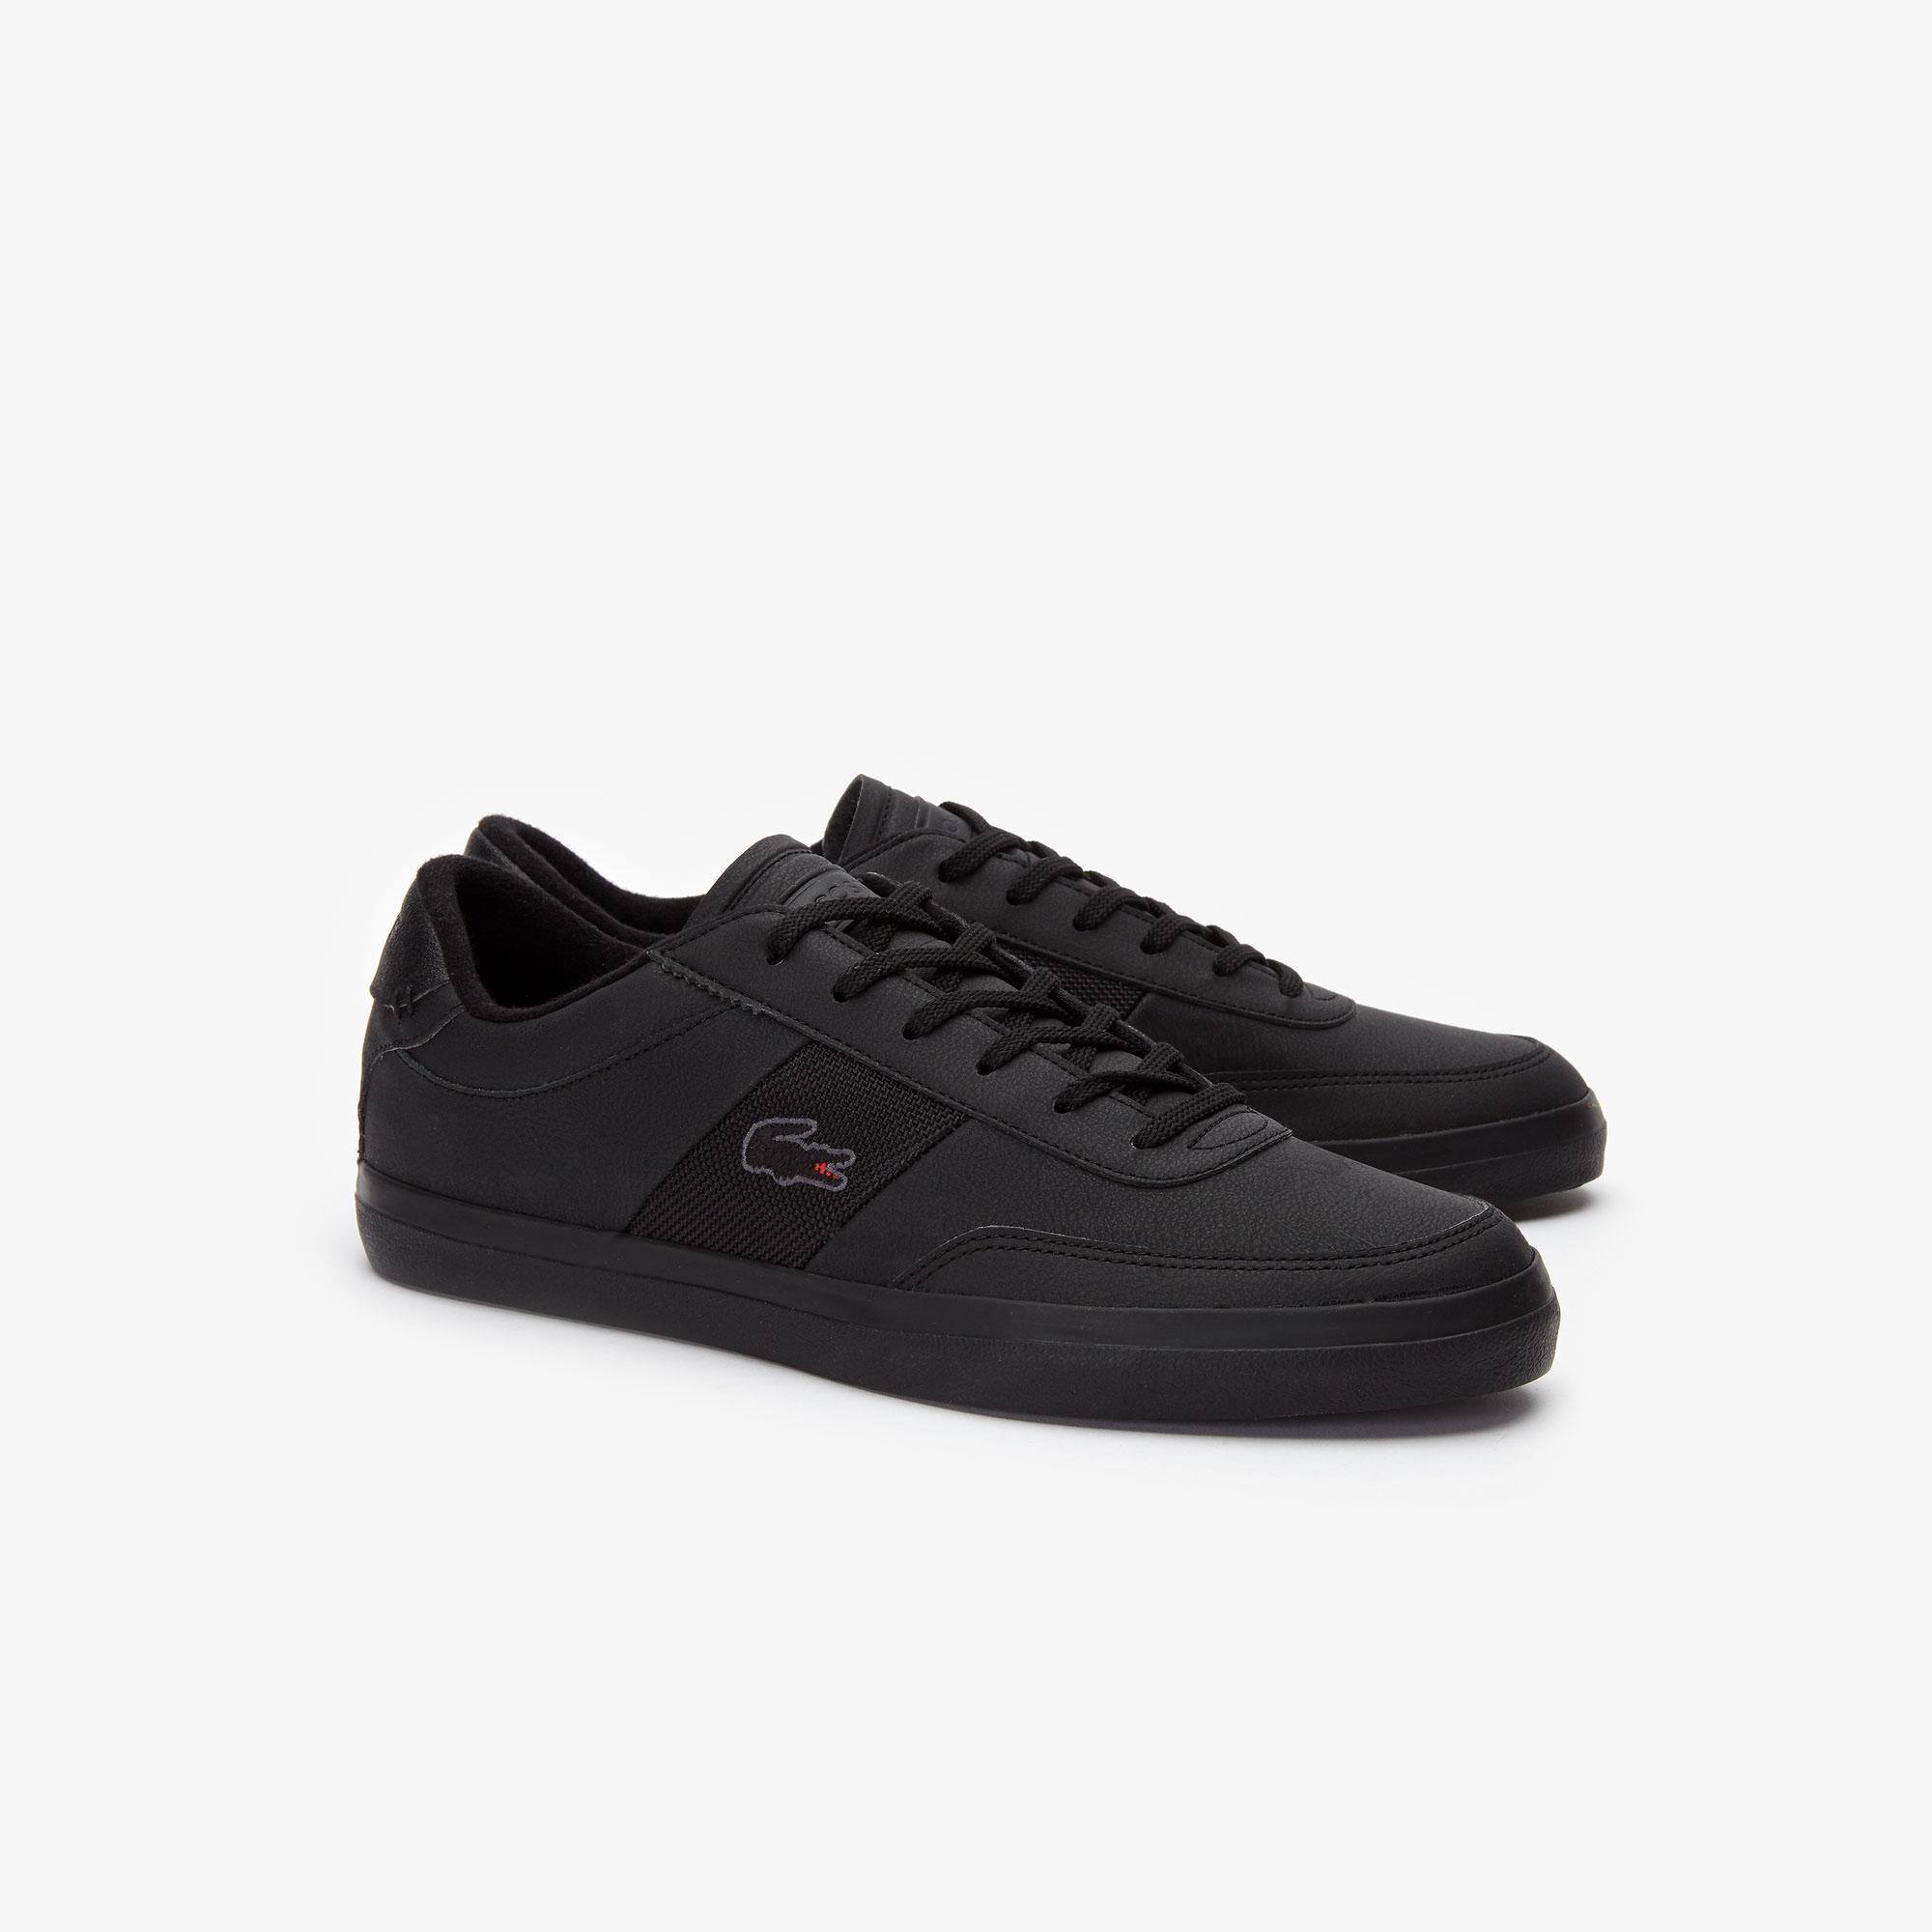 Lacoste Court-Master 319 5 Cma Erkek Siyah Casual Ayakkabı